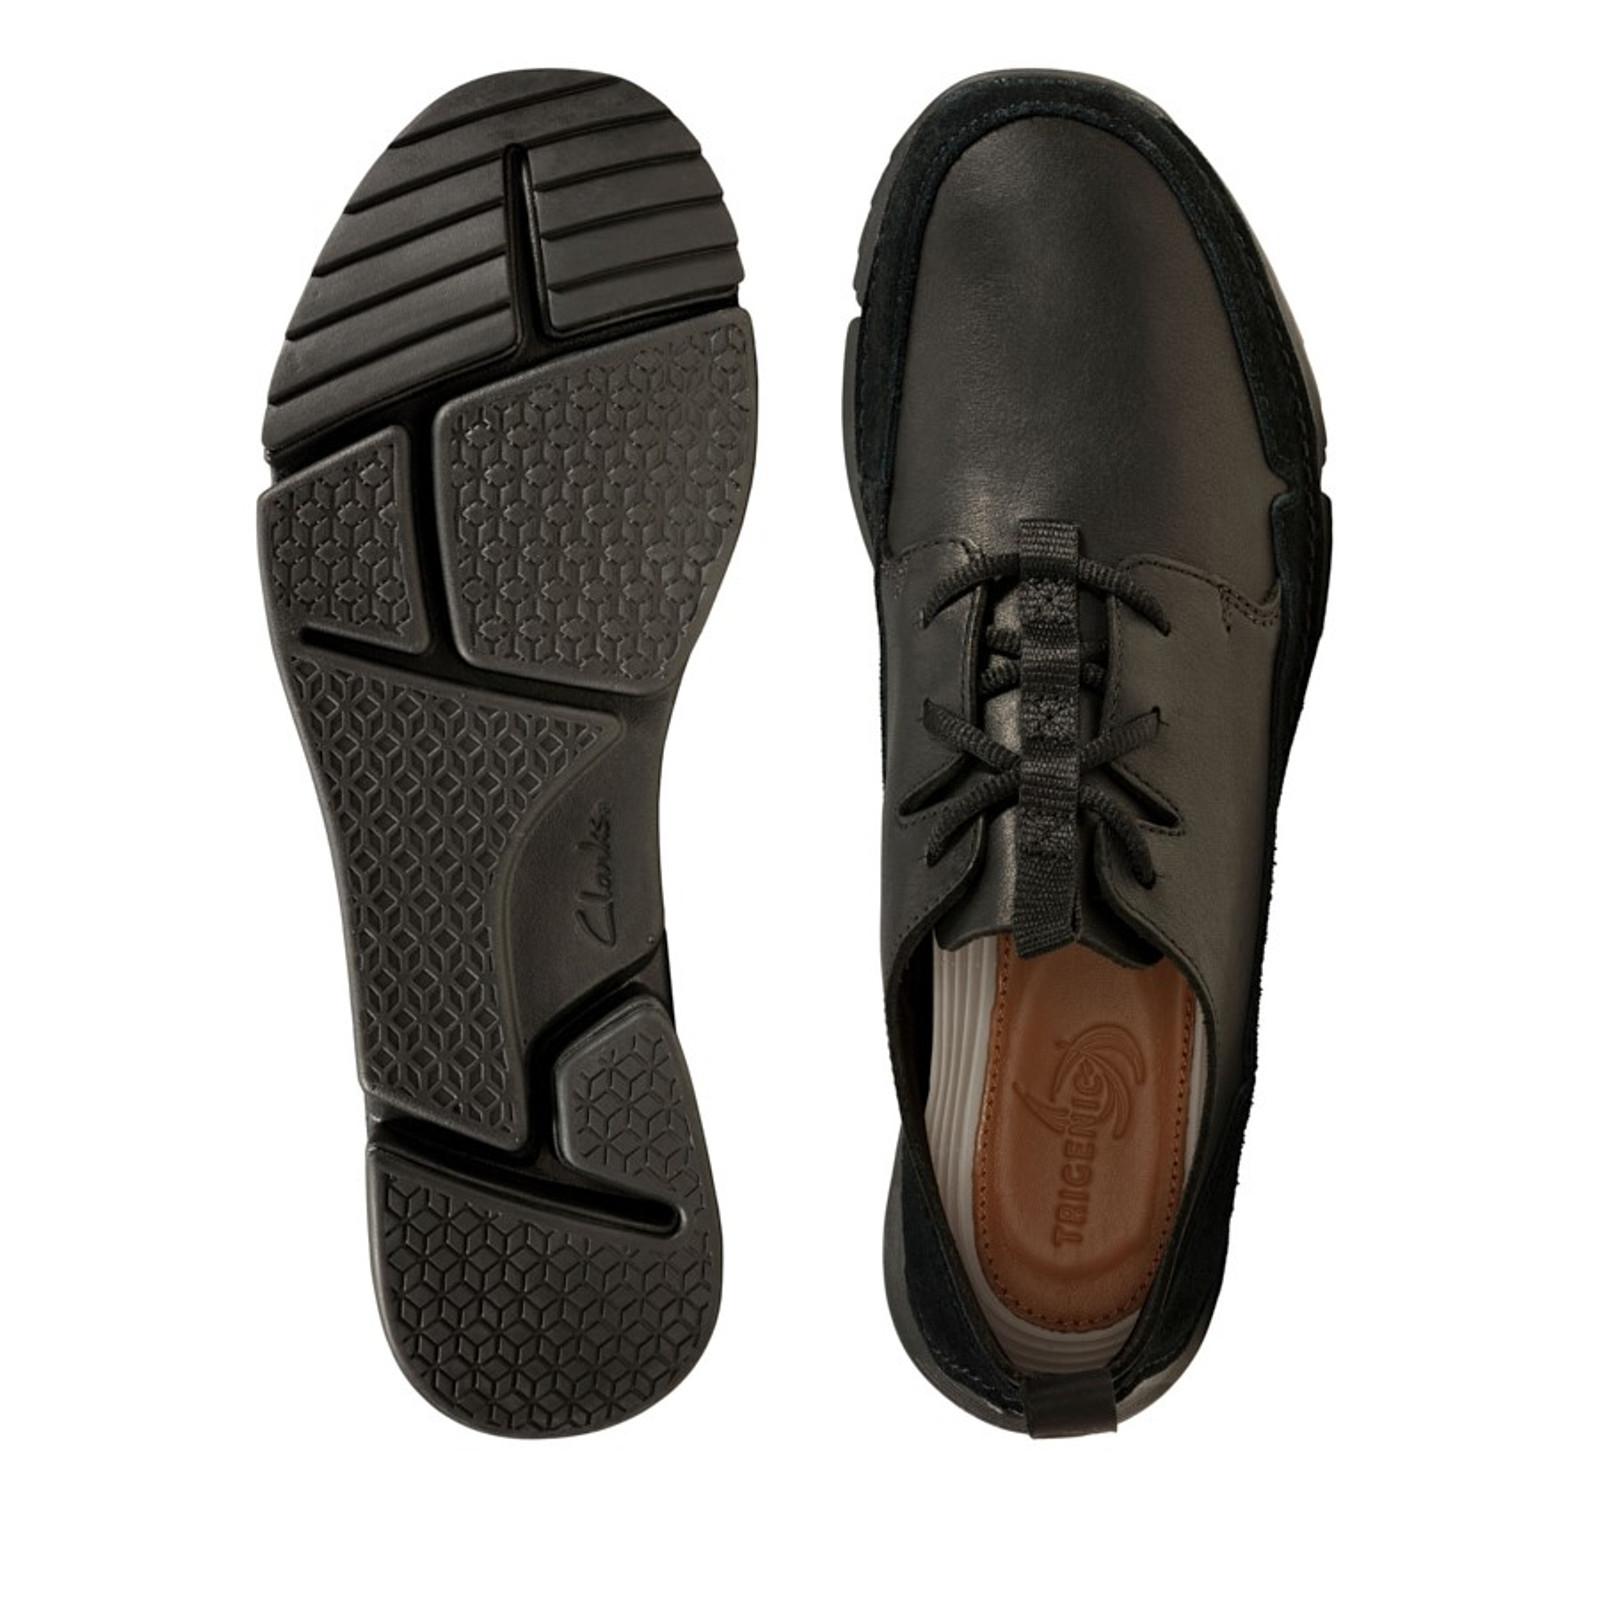 Clarks Mens TRI SOLAR Black Leather